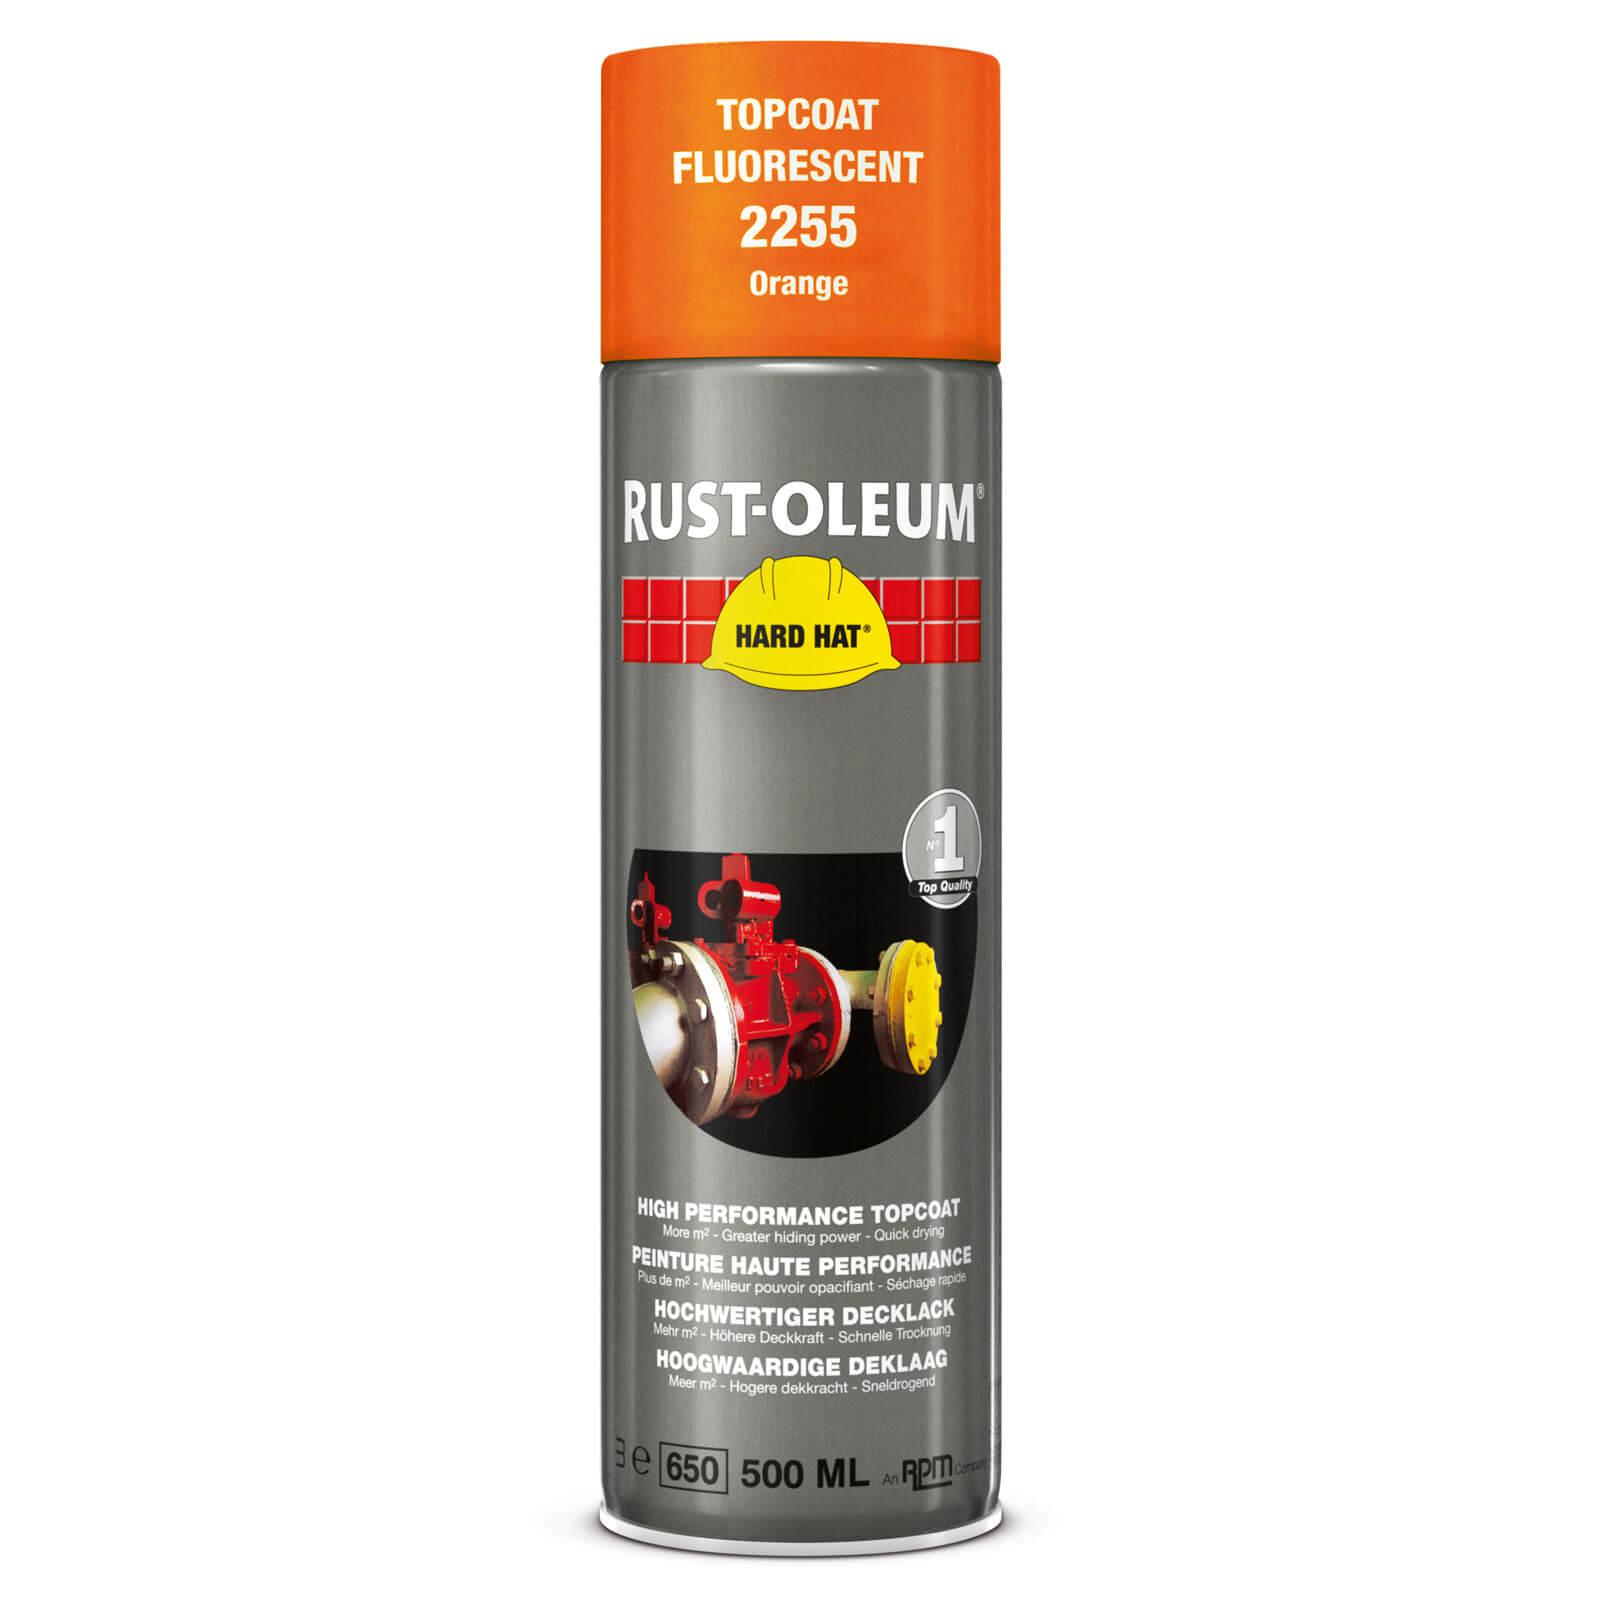 Image of Rust Oleum Hard Hat Fluorescent Spray Paint Orange 500ml